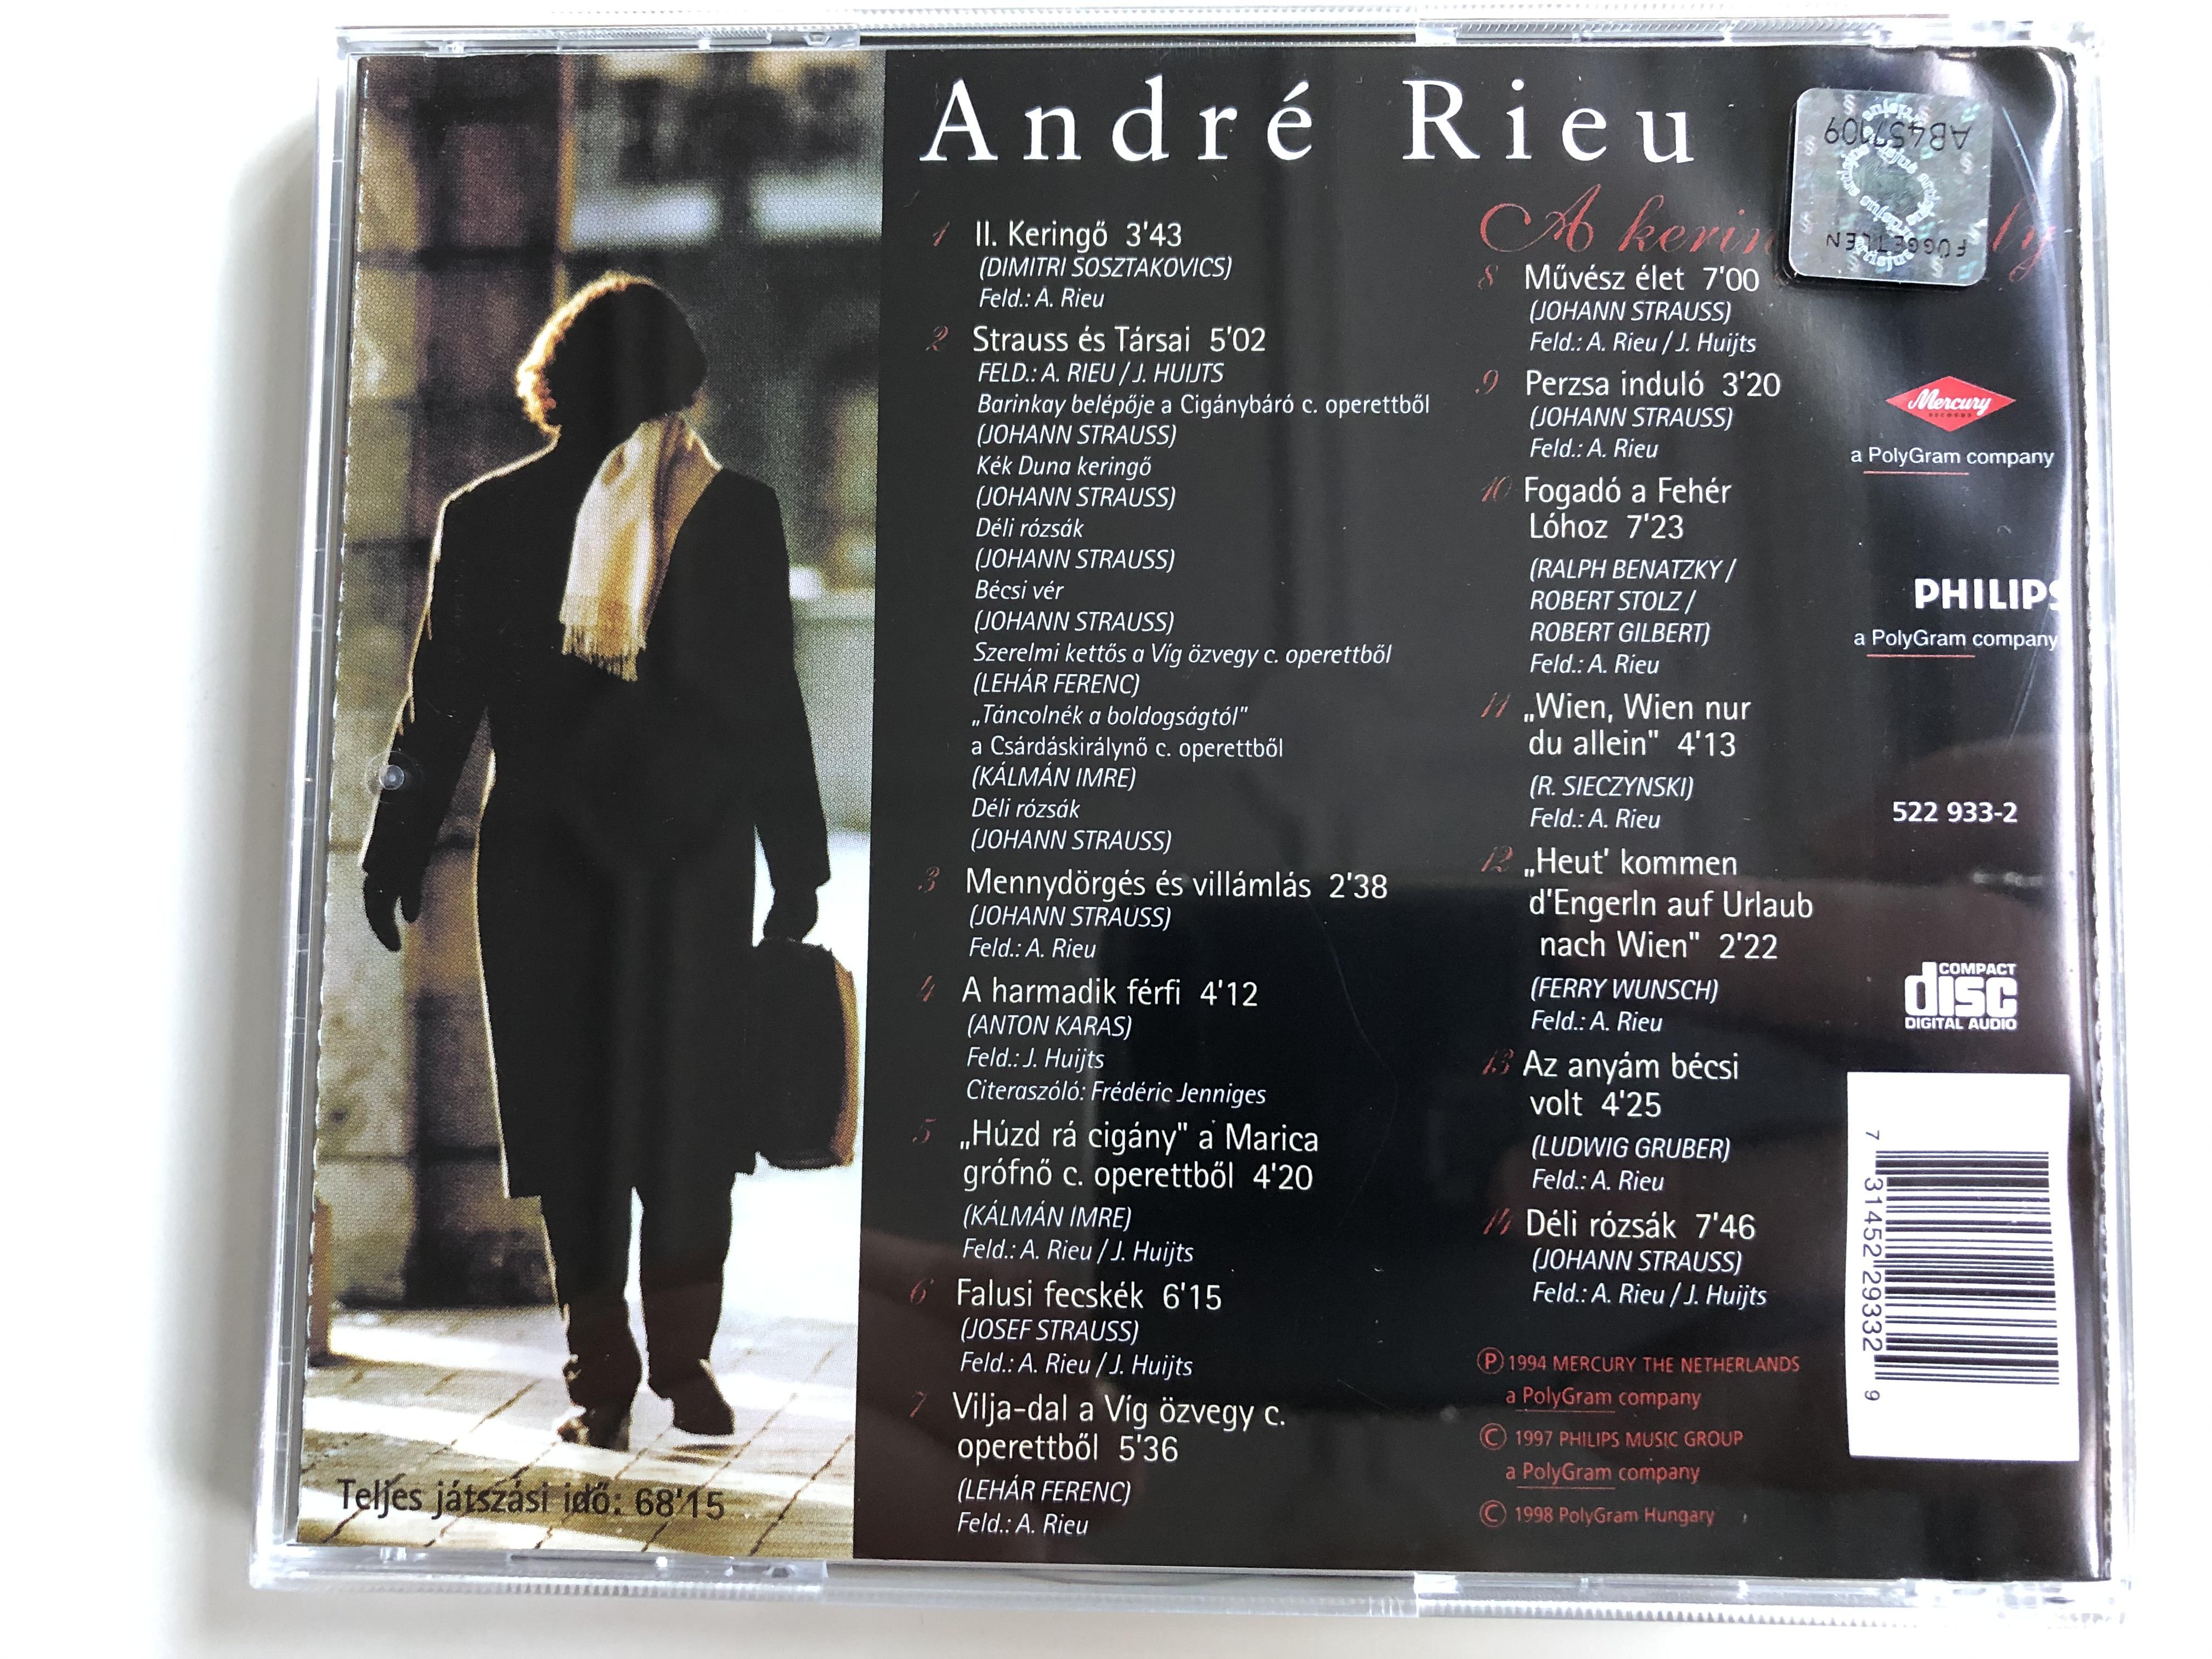 andr-rieu-a-keringokiraly-philips-audio-cd-1998-522-933-2-3-.jpg